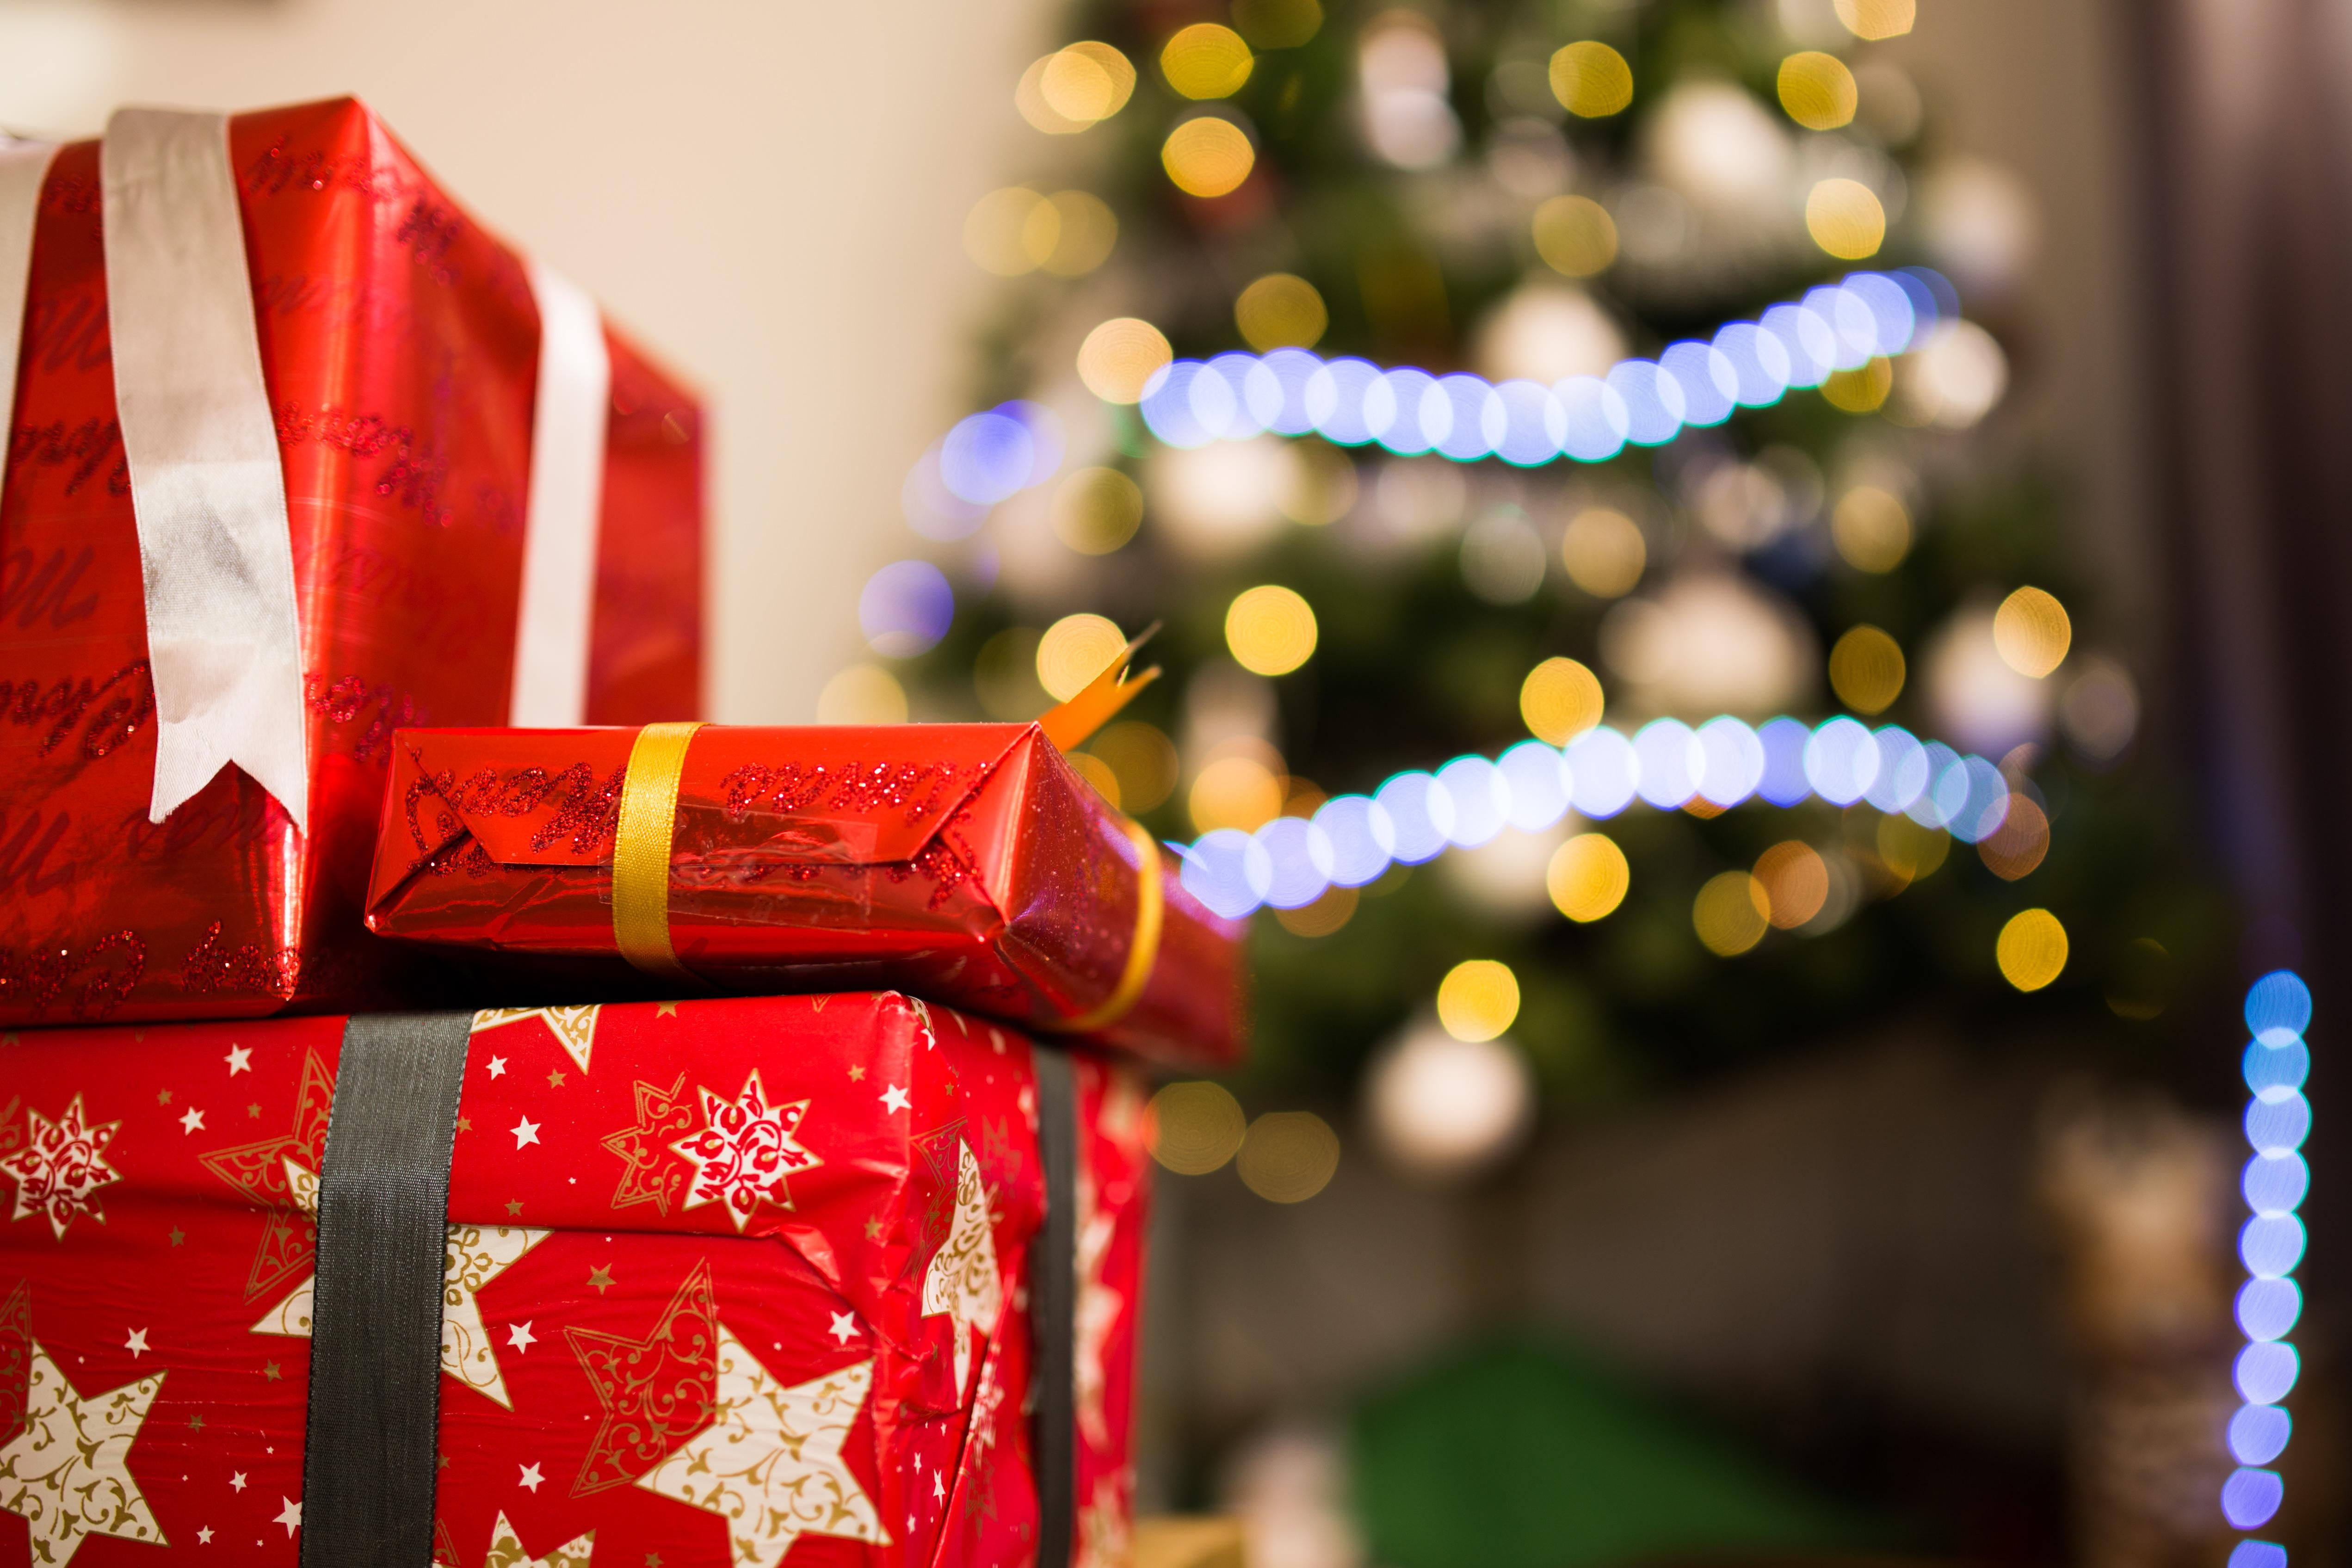 Three Gifts - Curtis Zimmerman